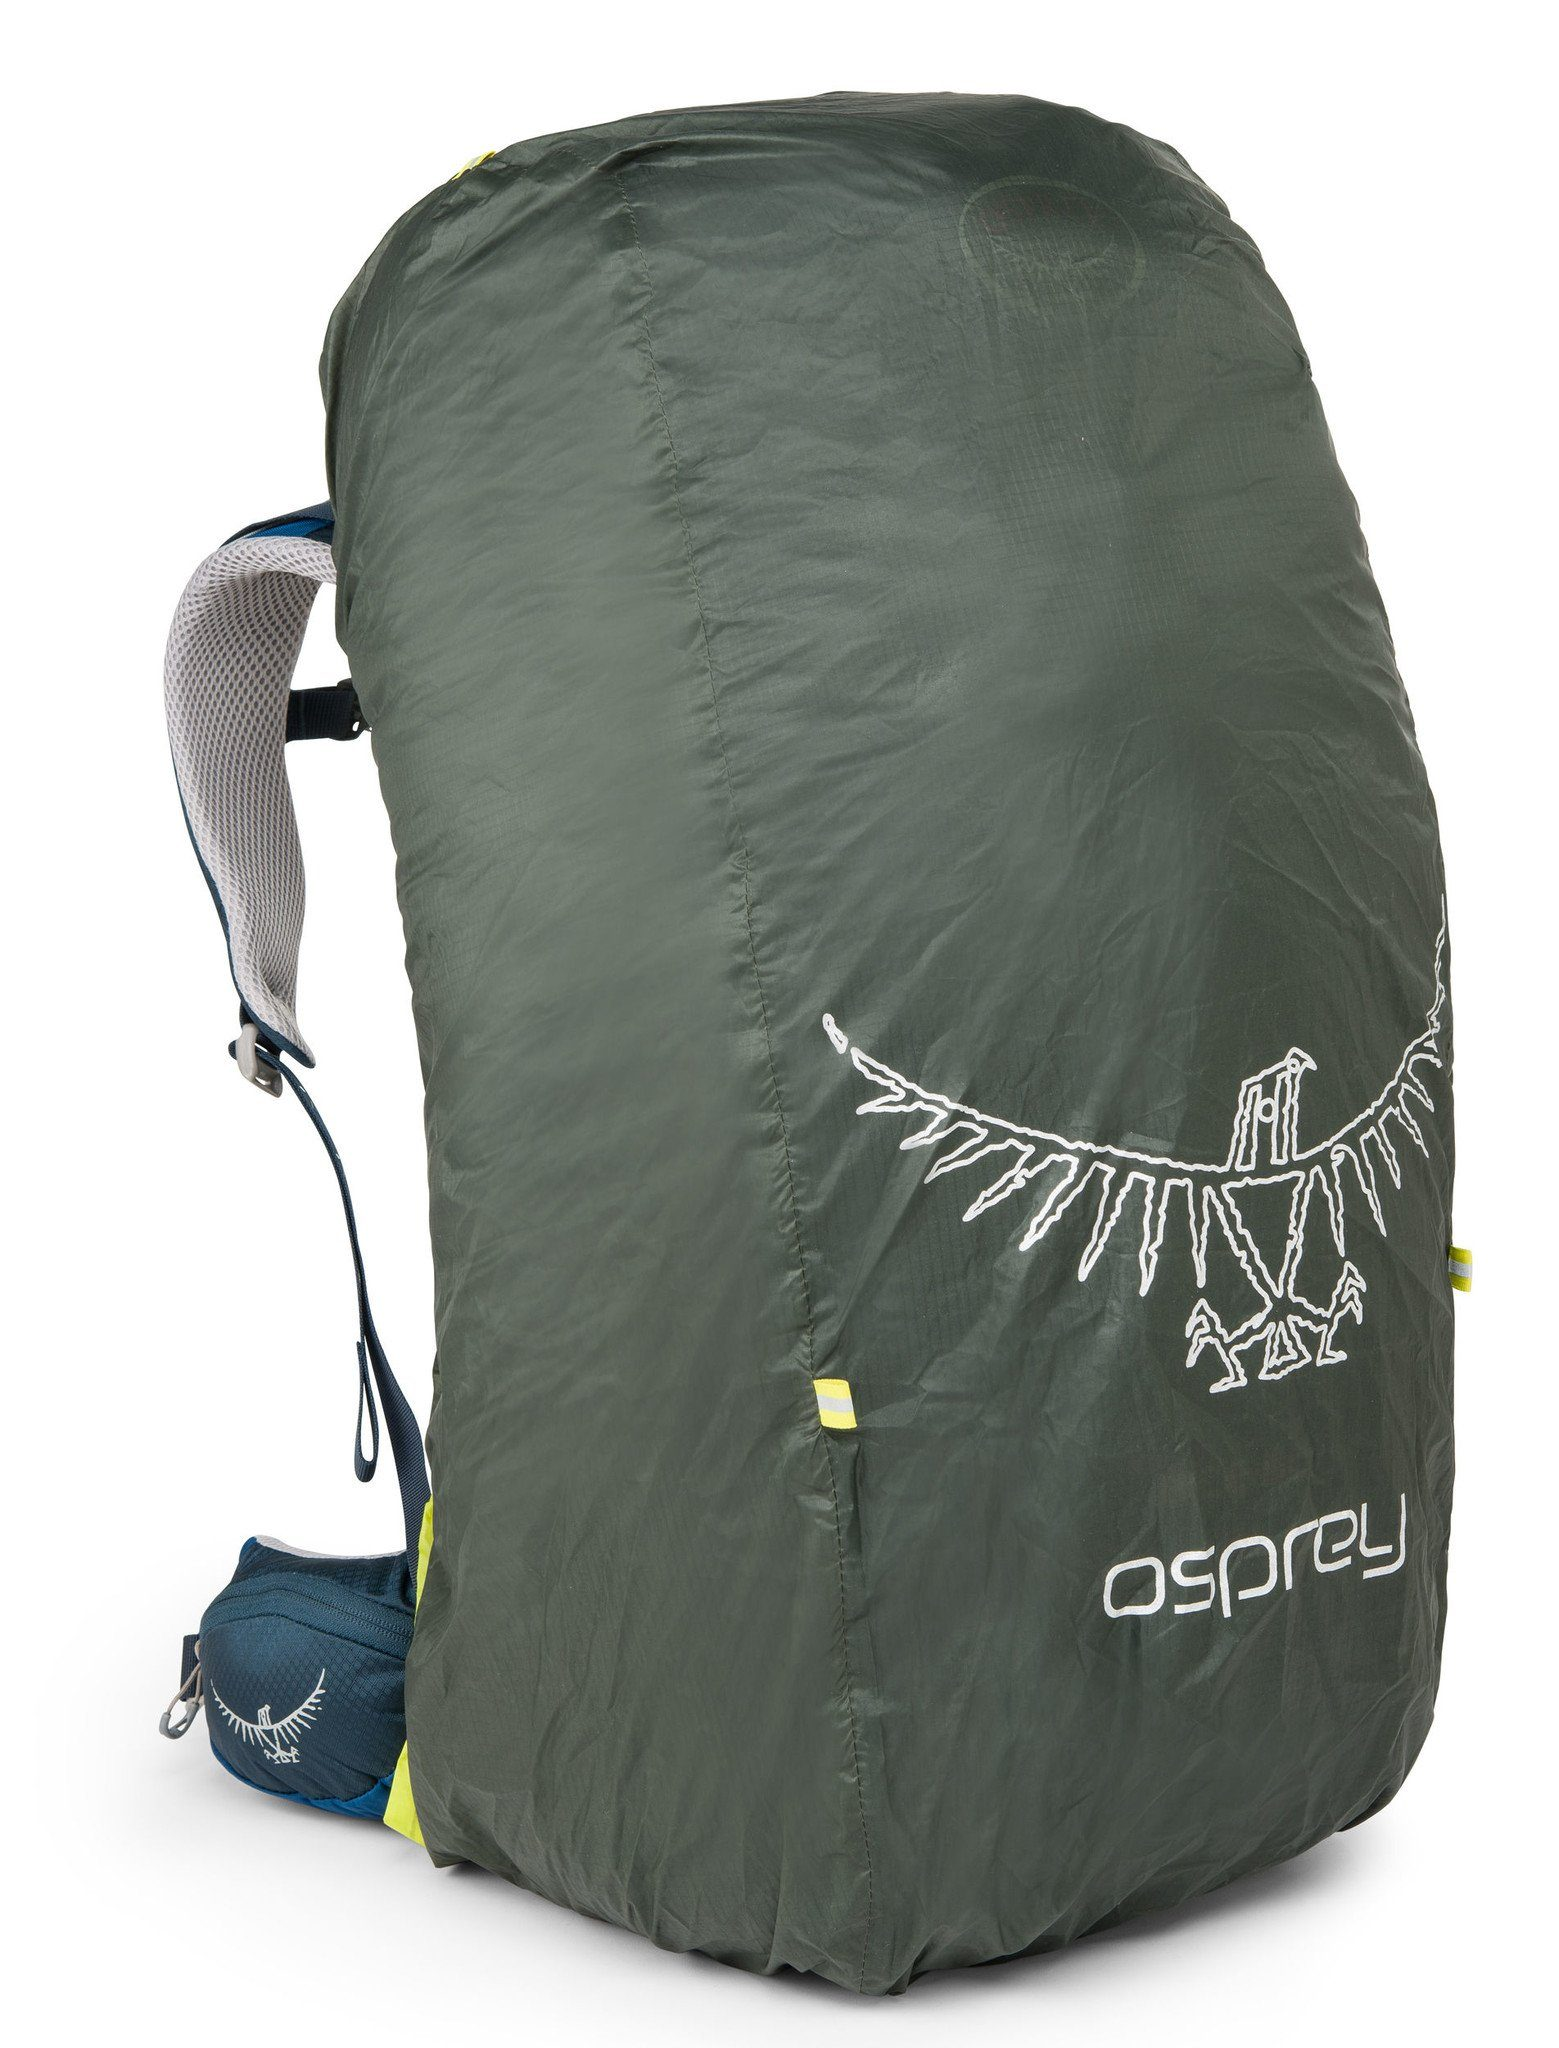 Osprey Wanderrucksack »Ultralight Raincover XL«